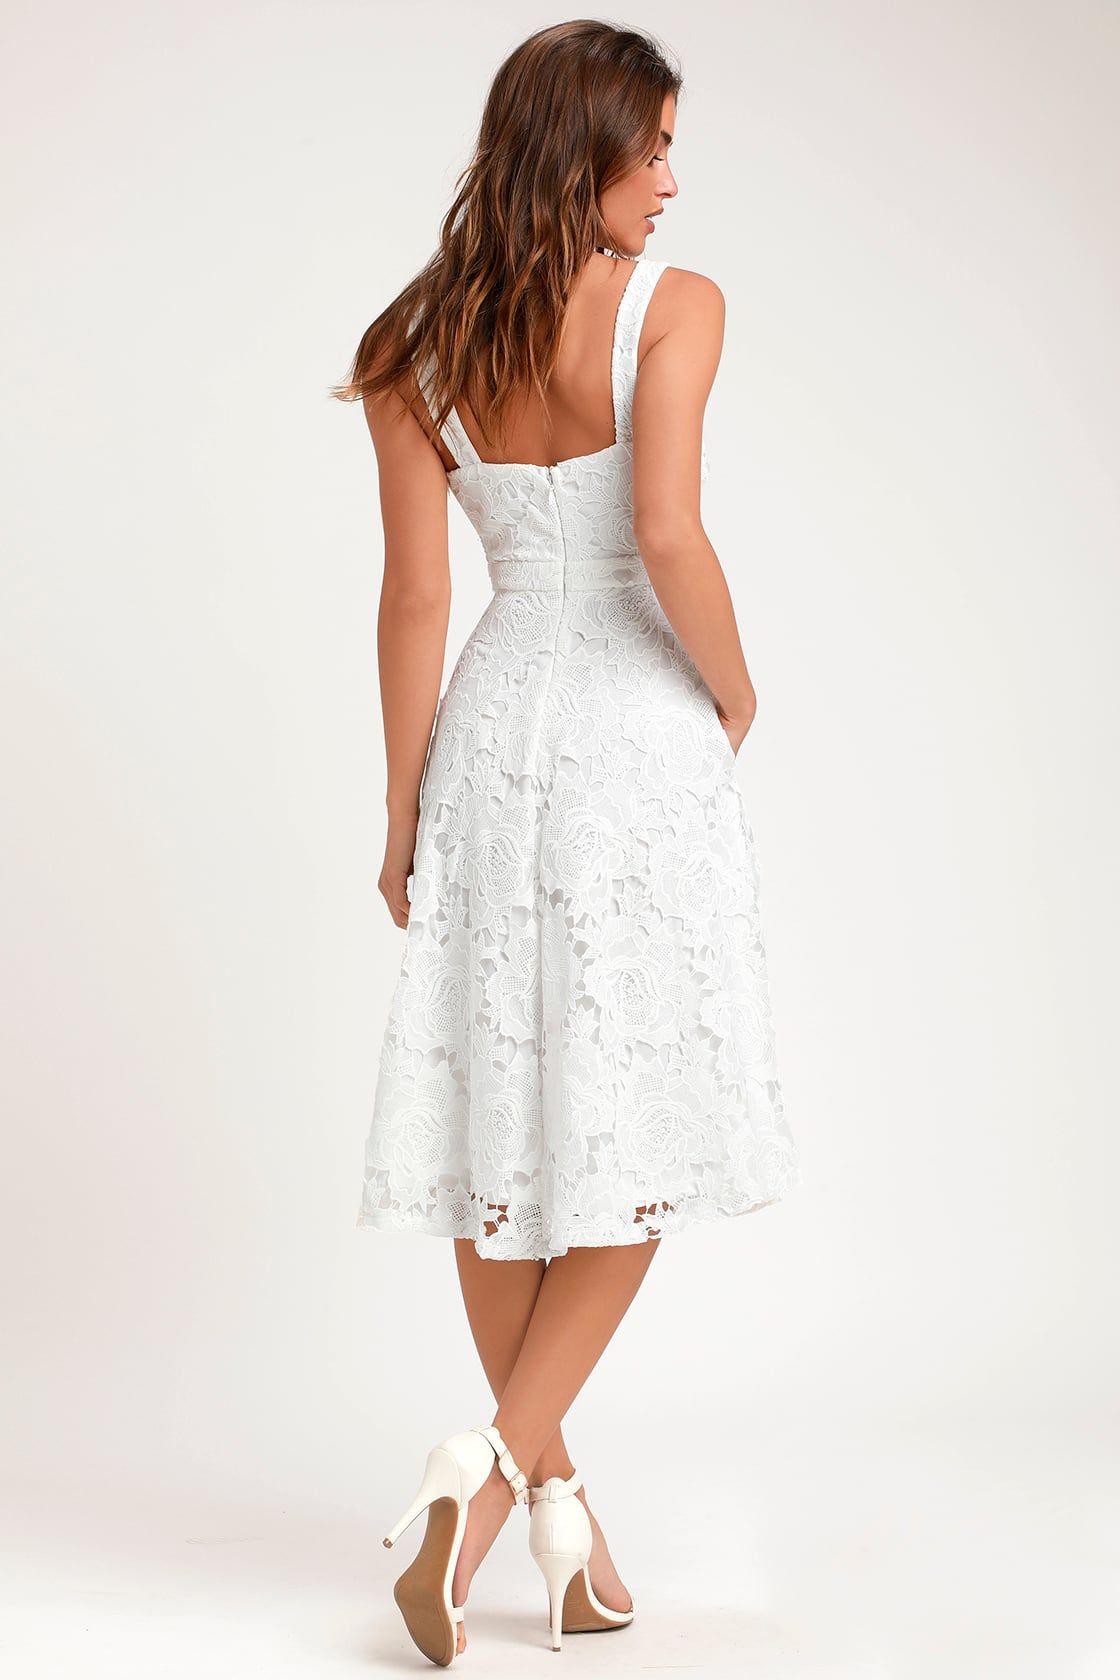 Divine Beauty White Lace Midi Dress White Lace Midi Dress White Dresses For Women White Cocktail Dress [ 1680 x 1120 Pixel ]